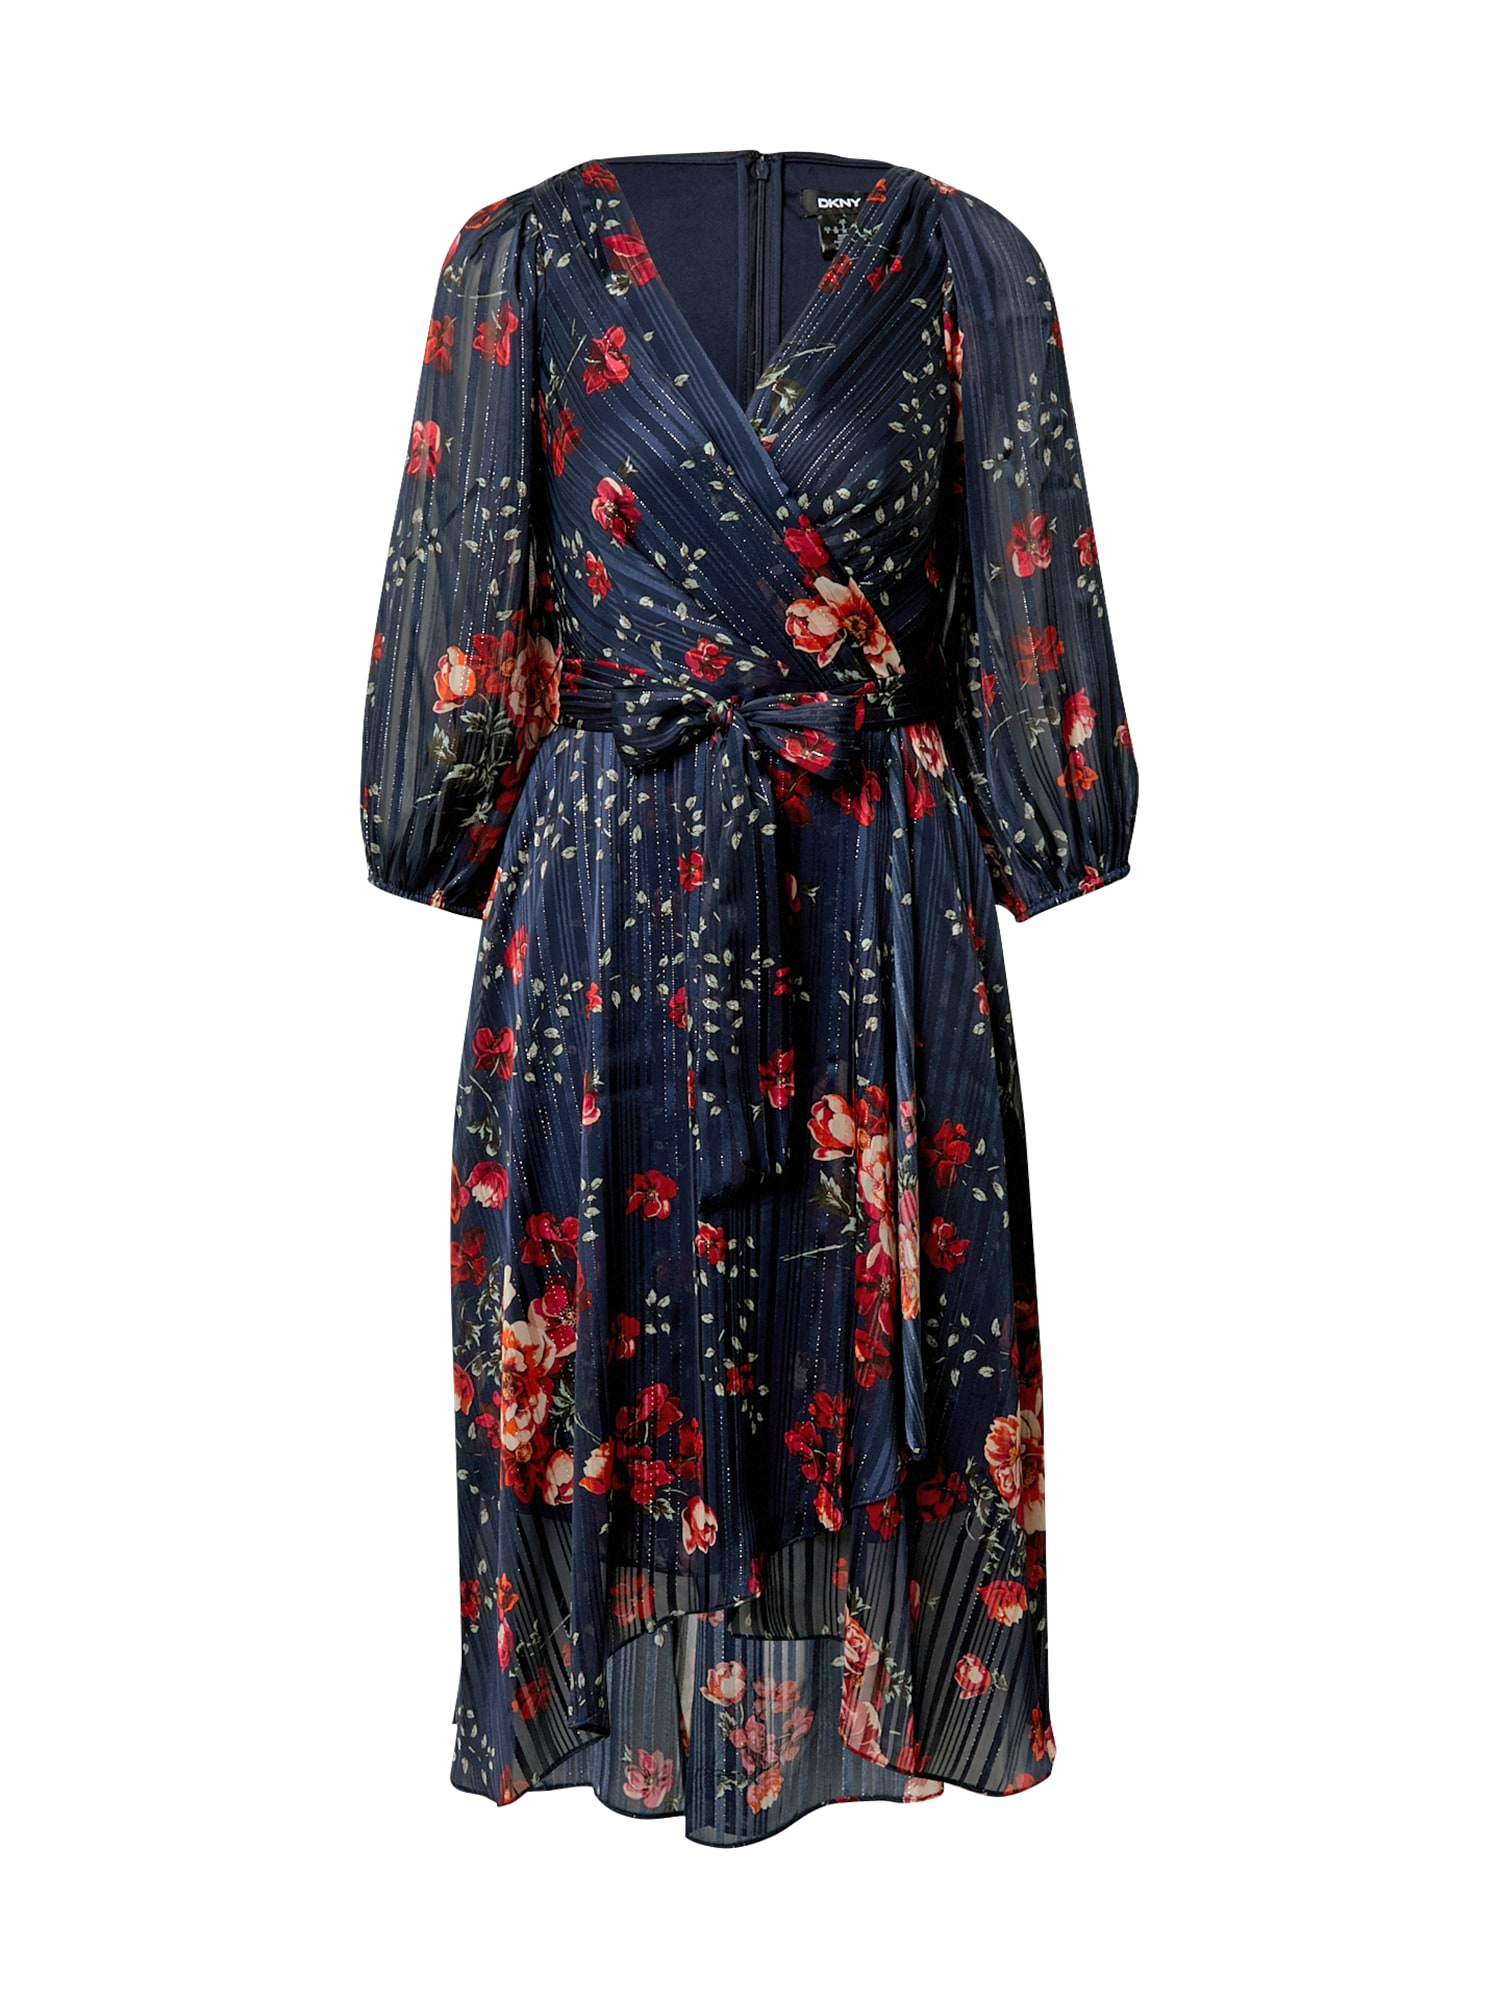 DKNY Suknelė mišrios spalvos / nakties mėlyna